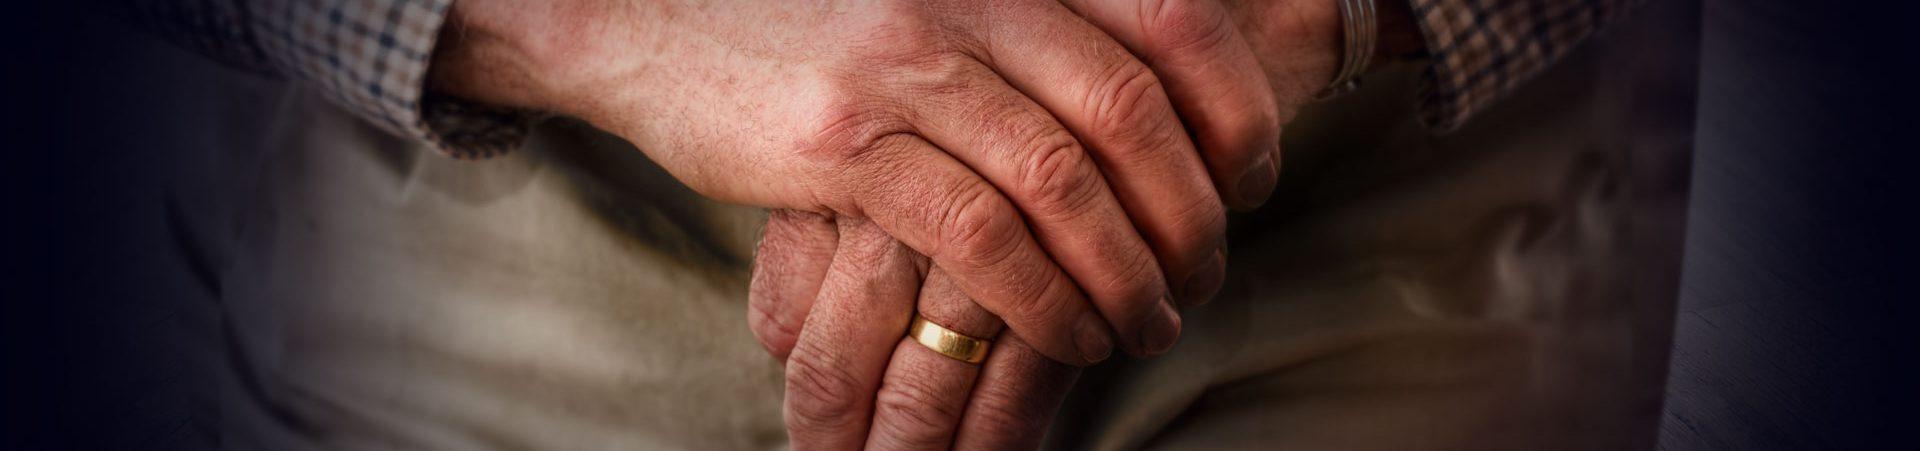 Rentner mit Gehstock in Pflege